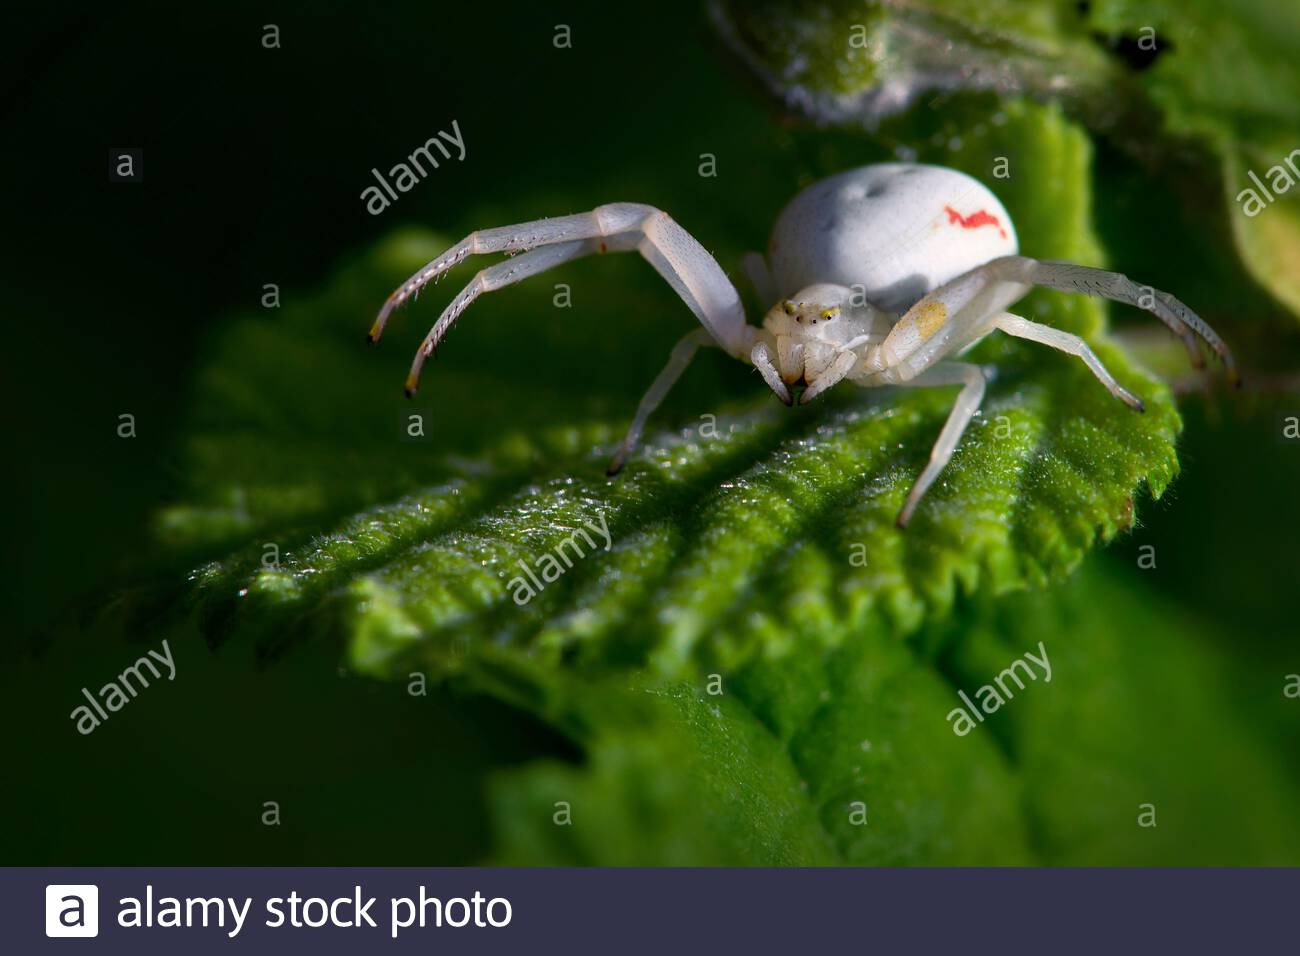 goldenrod-crab-spider-white-female-misum